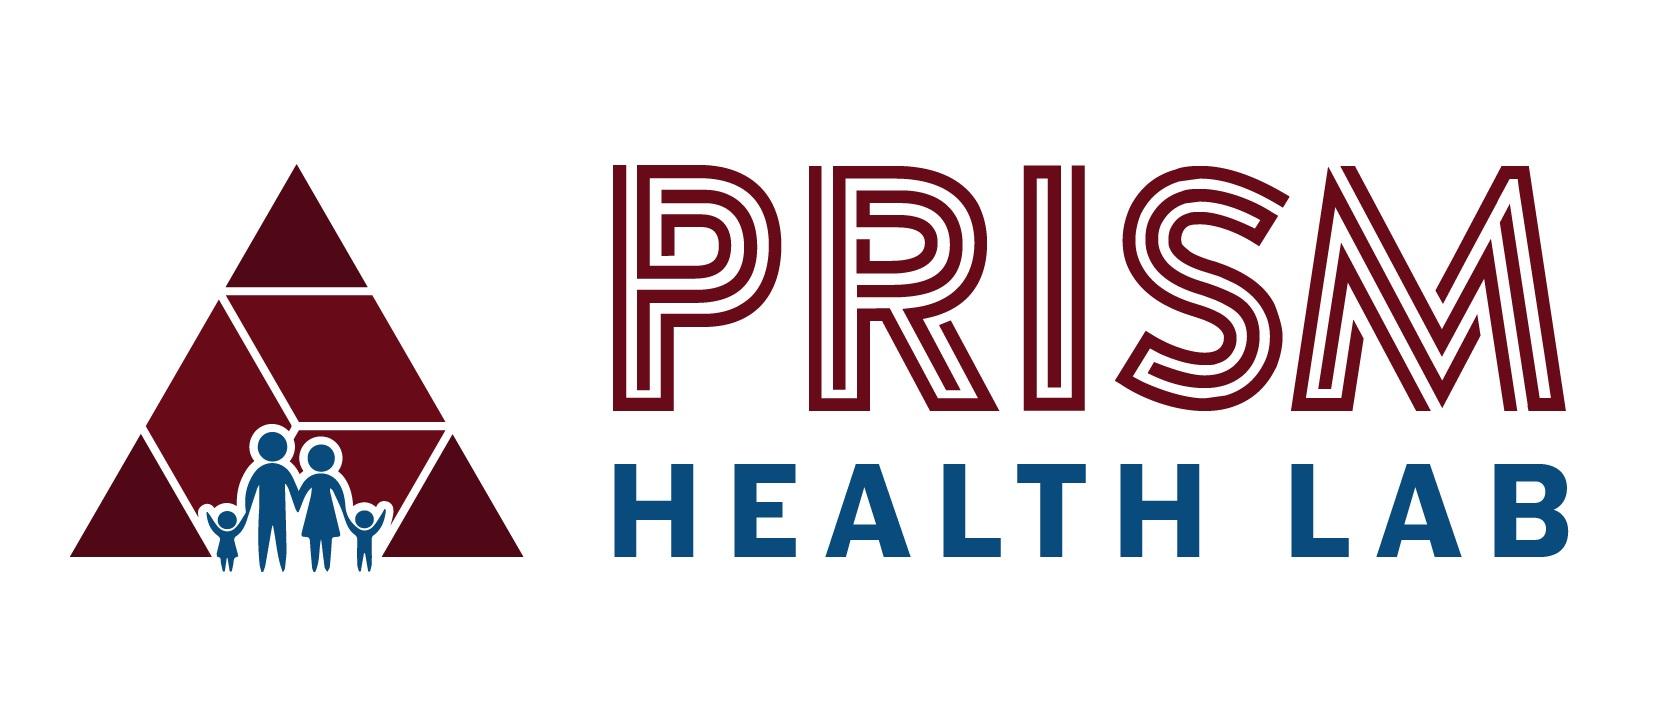 Prism Health Lab